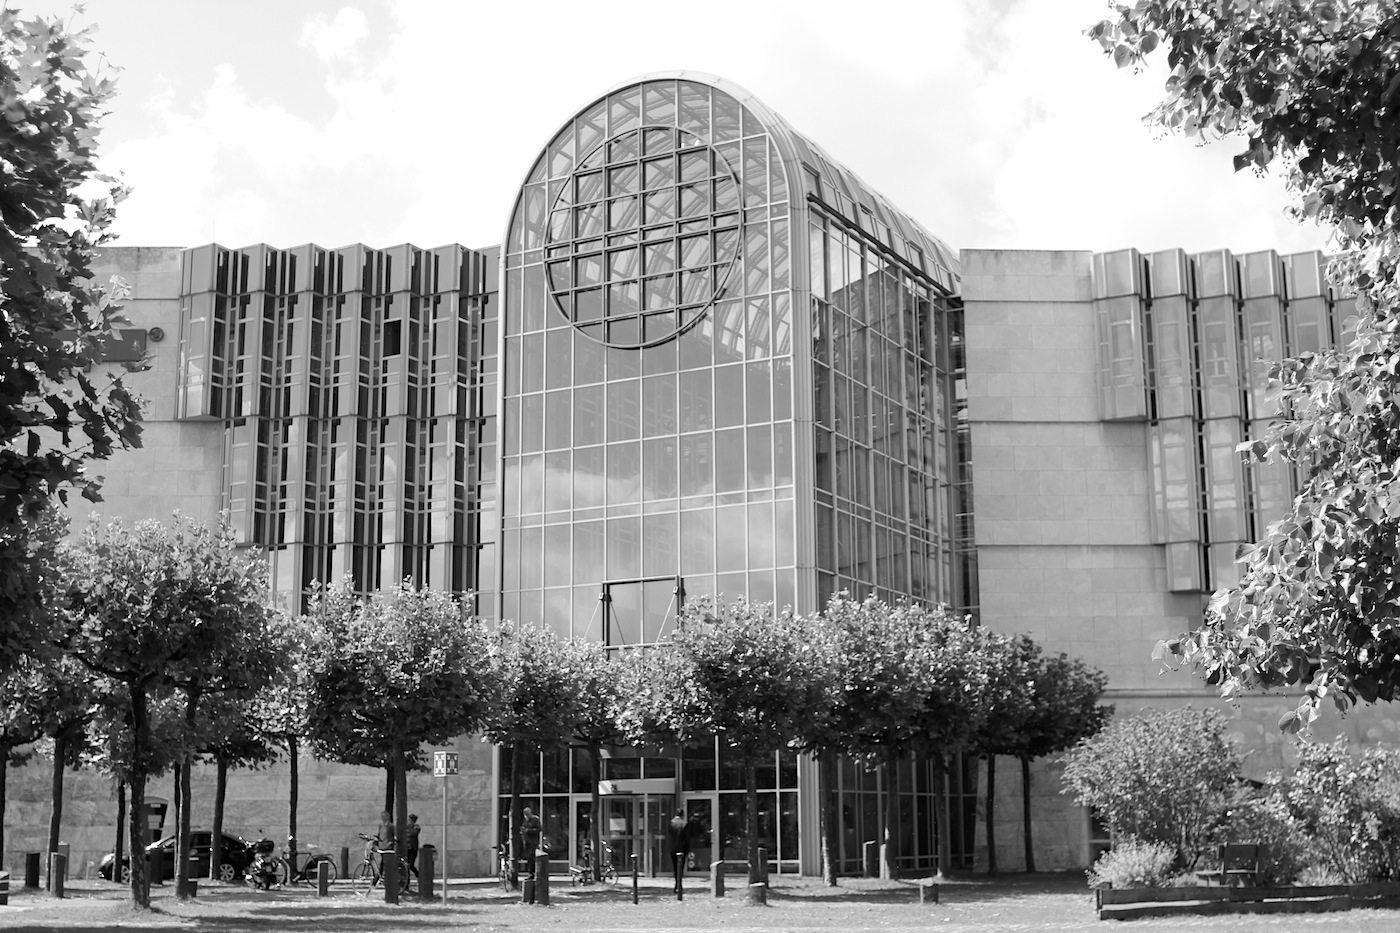 Westdeutscher Rundfunk, broadcasting centre.  The hall resembles a radio receiver.